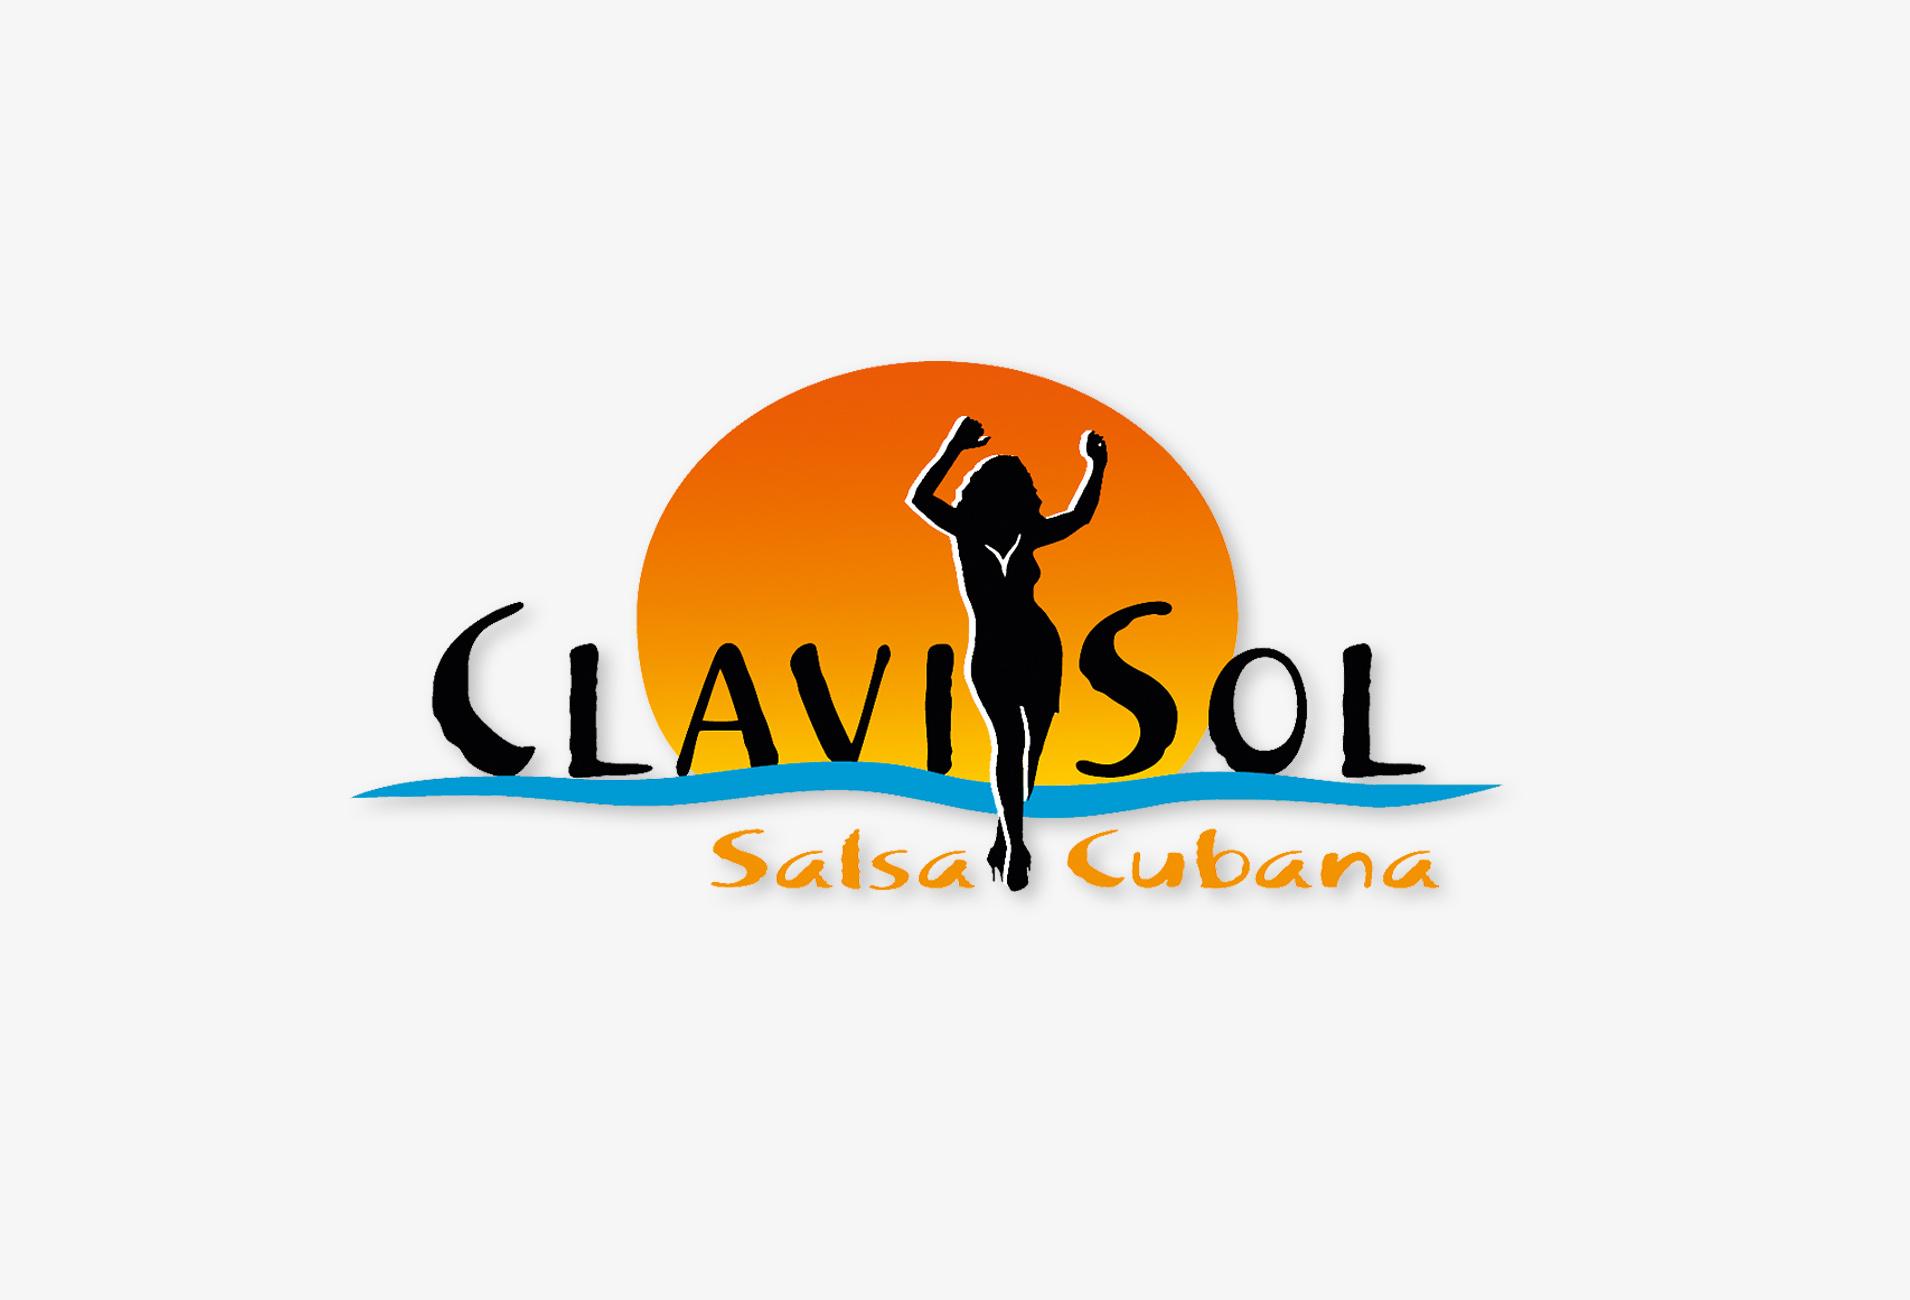 clavisol-logo